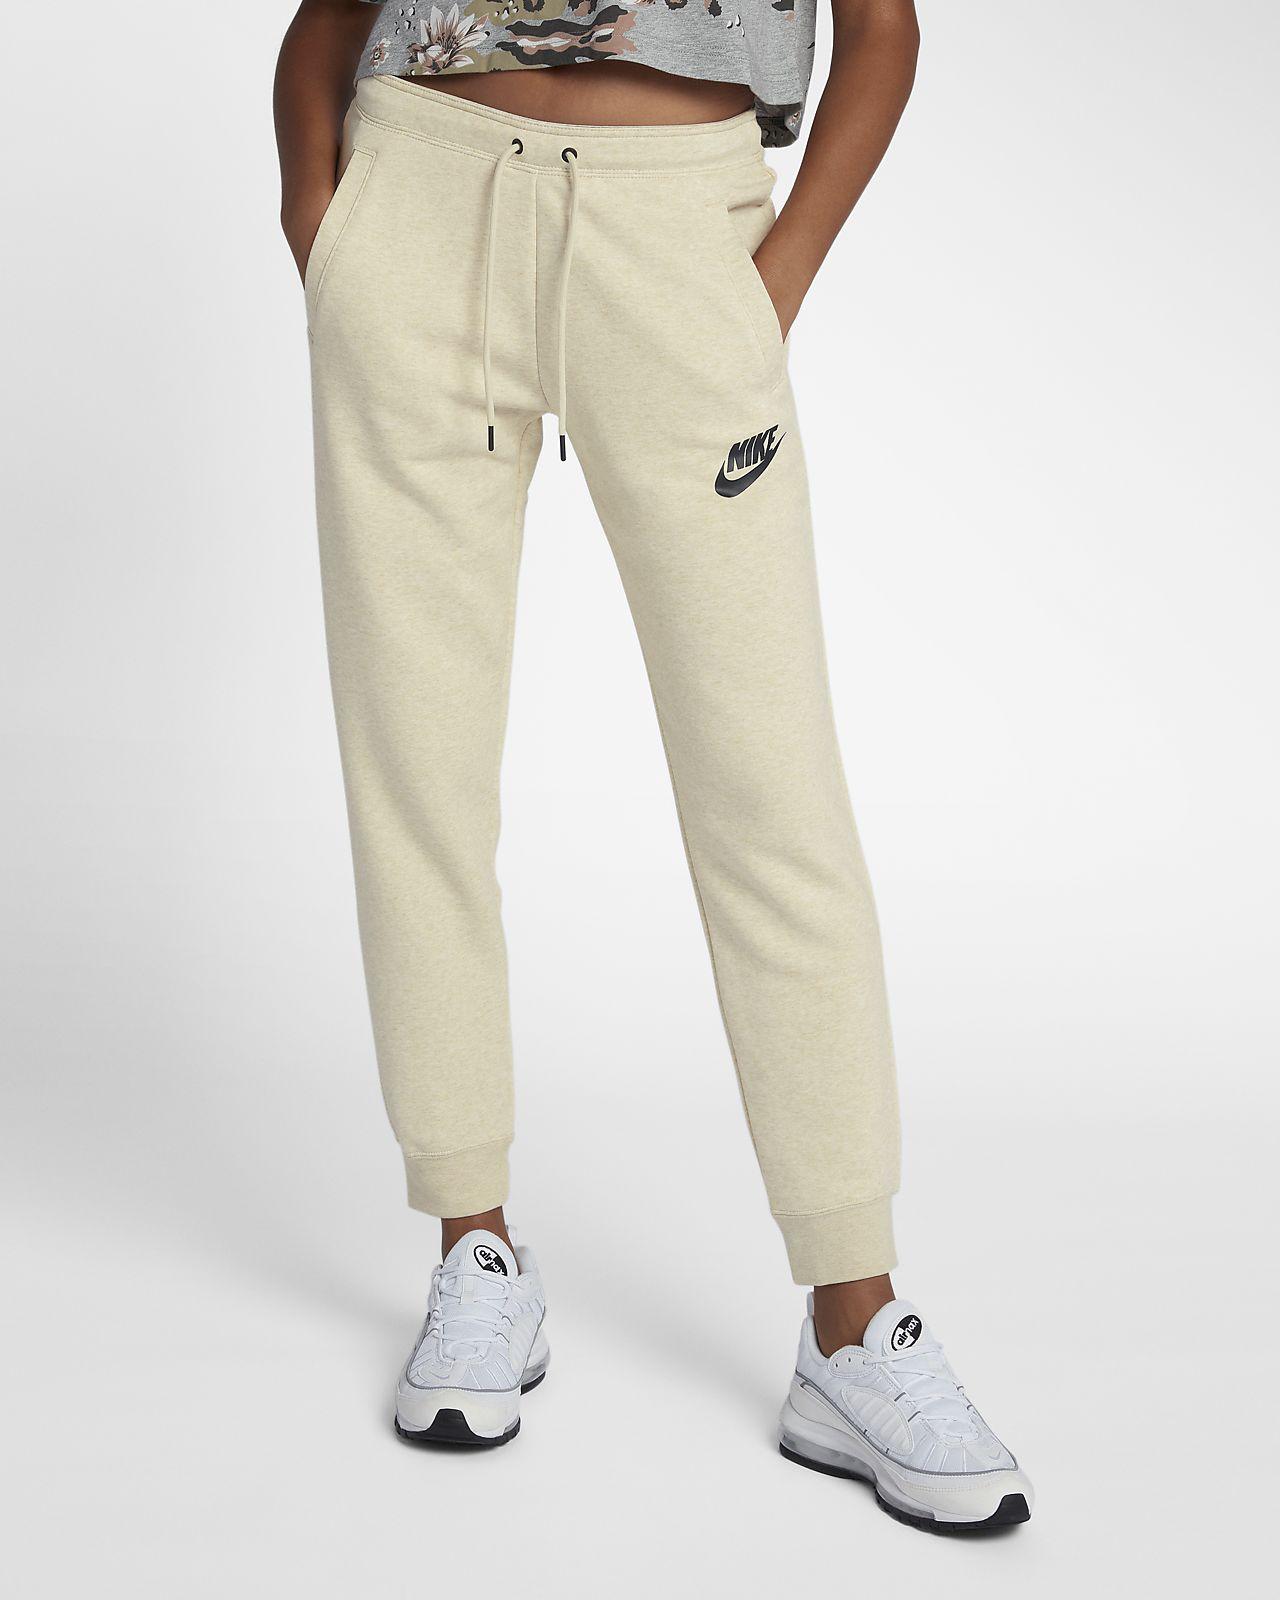 Damenhose Sportswear Damenhose Nike Sportswear Nike Ch Nike Ch Ch Rally Sportswear Rally Damenhose Nike Rally ZnqqdOC